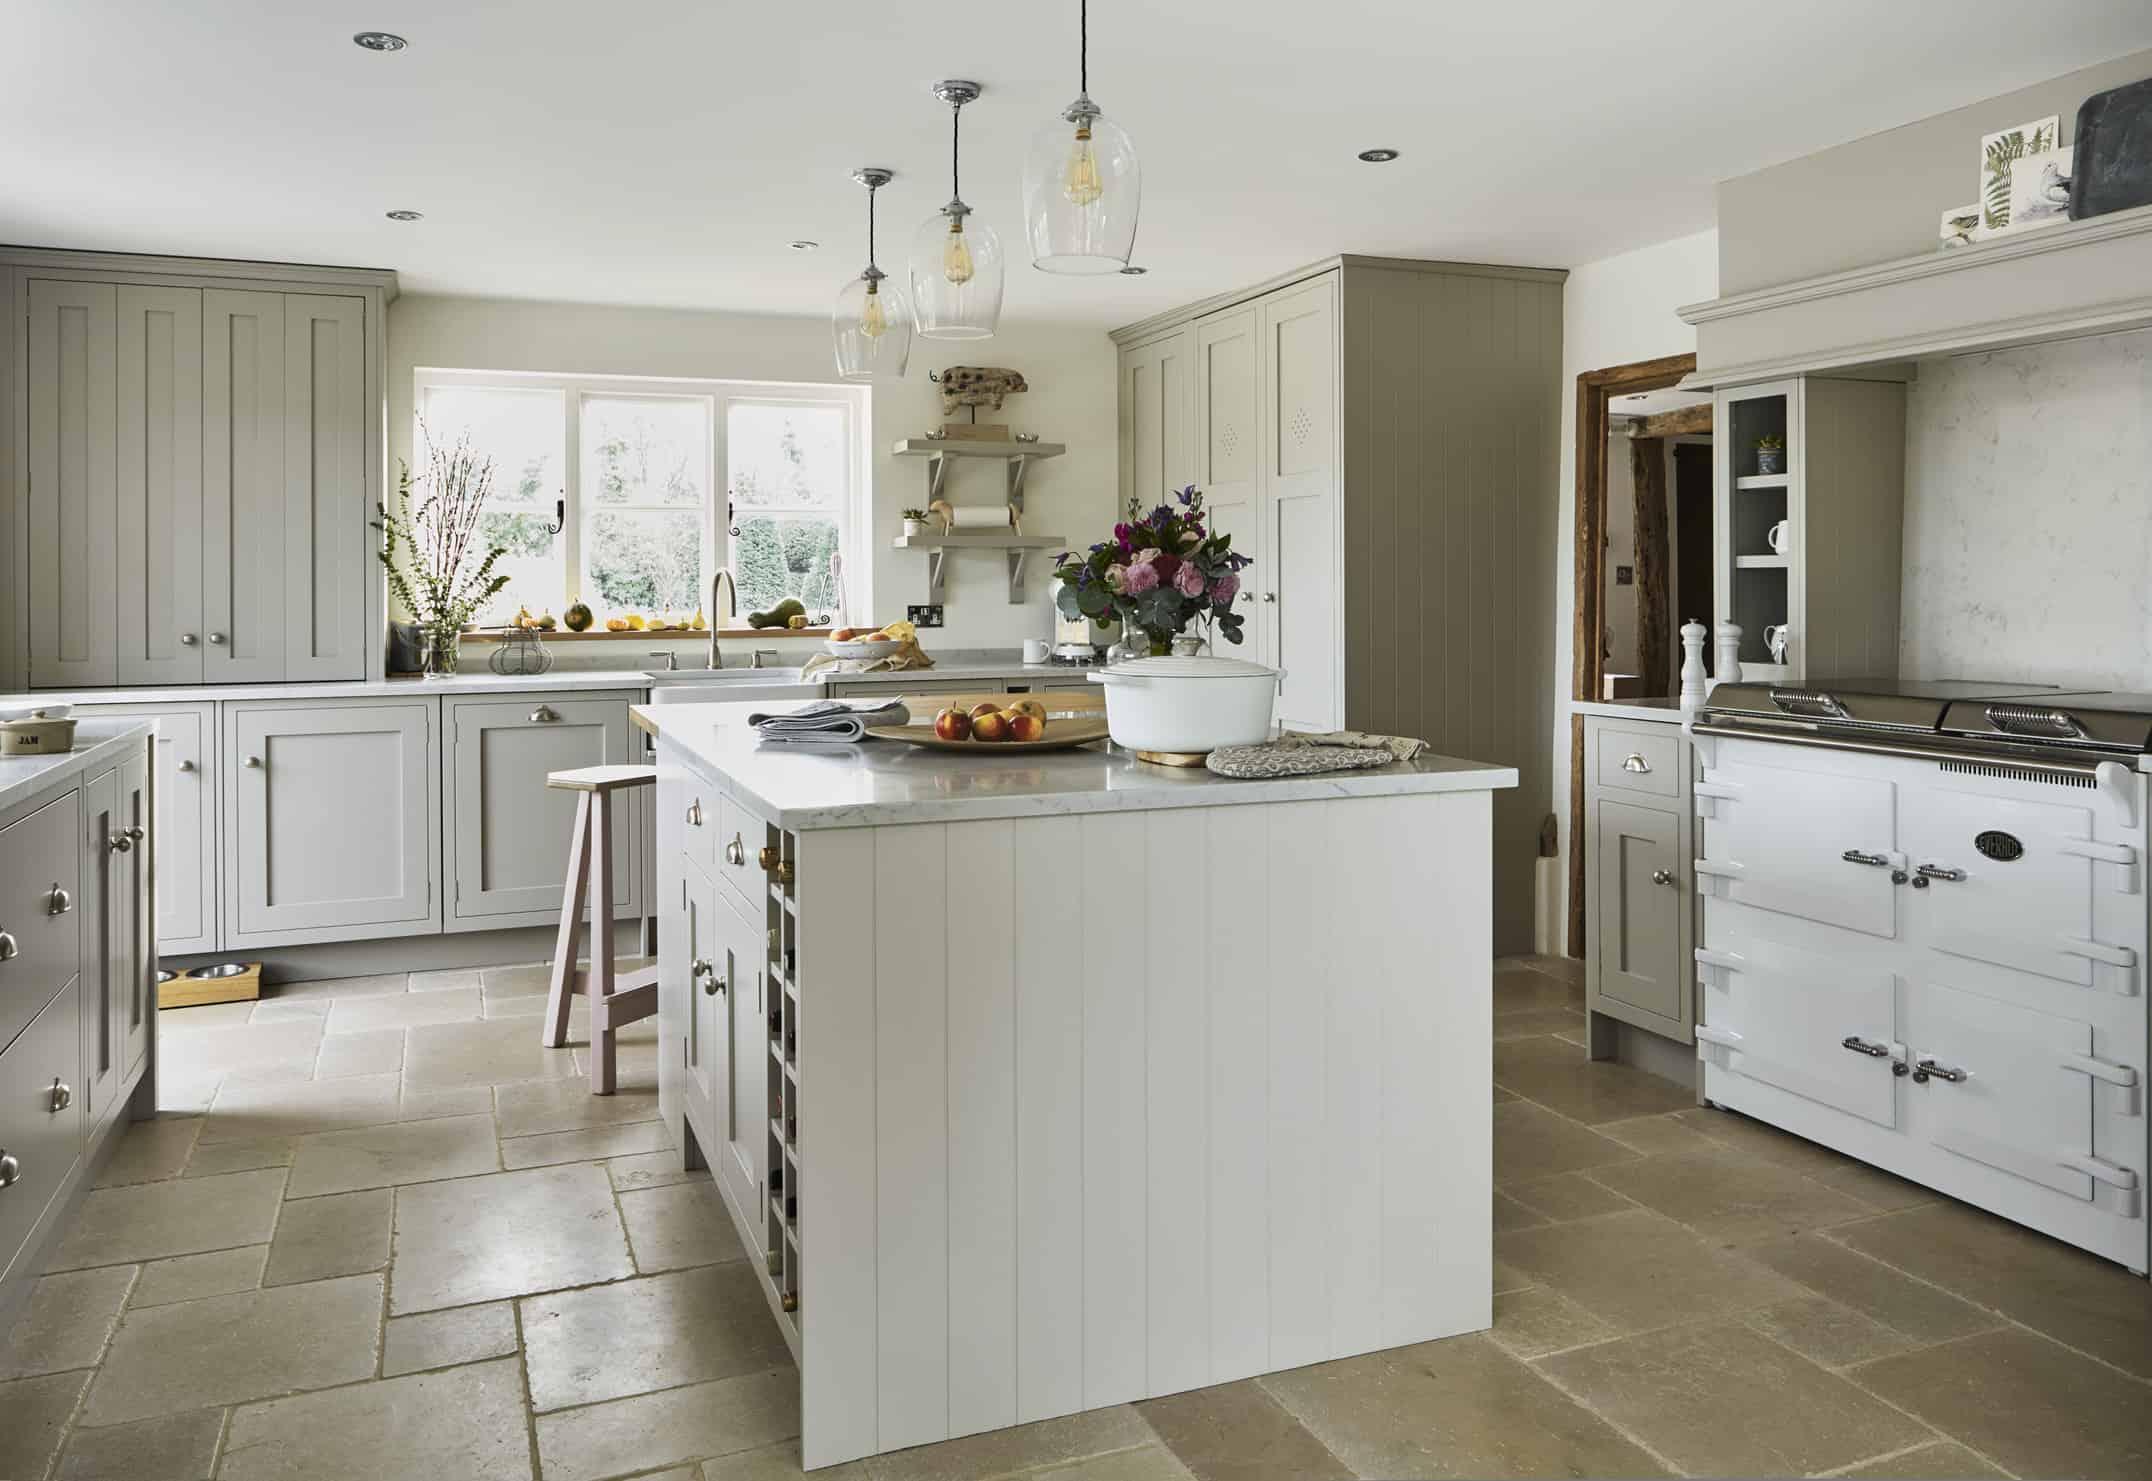 Shaker Kitchens & Bespoke Design   John Lewis of Hungerford